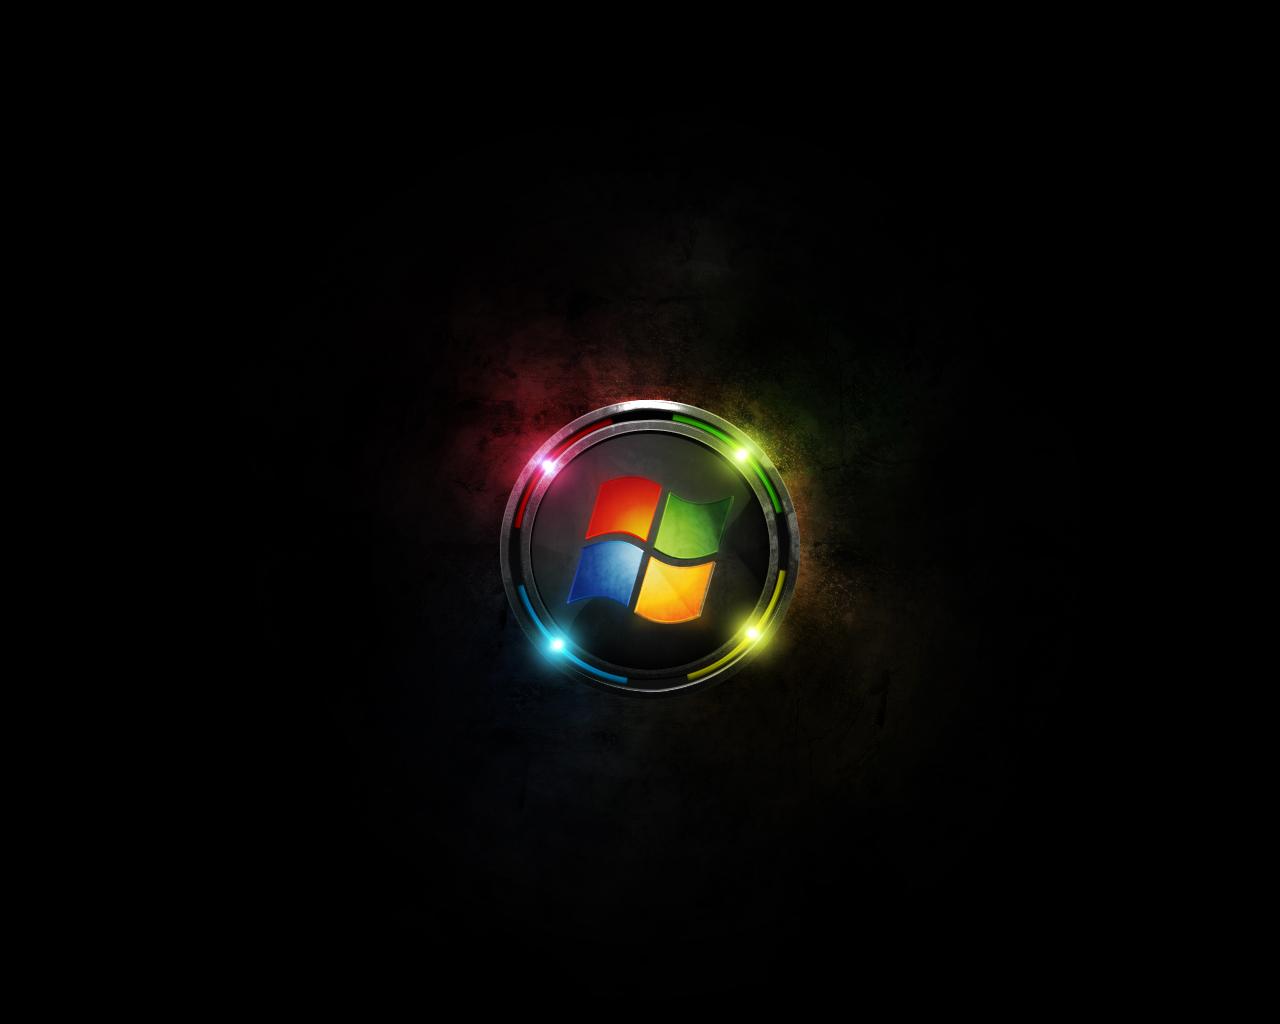 Windows 7 Black Wallpaper Hd 25 Free Wallpaper